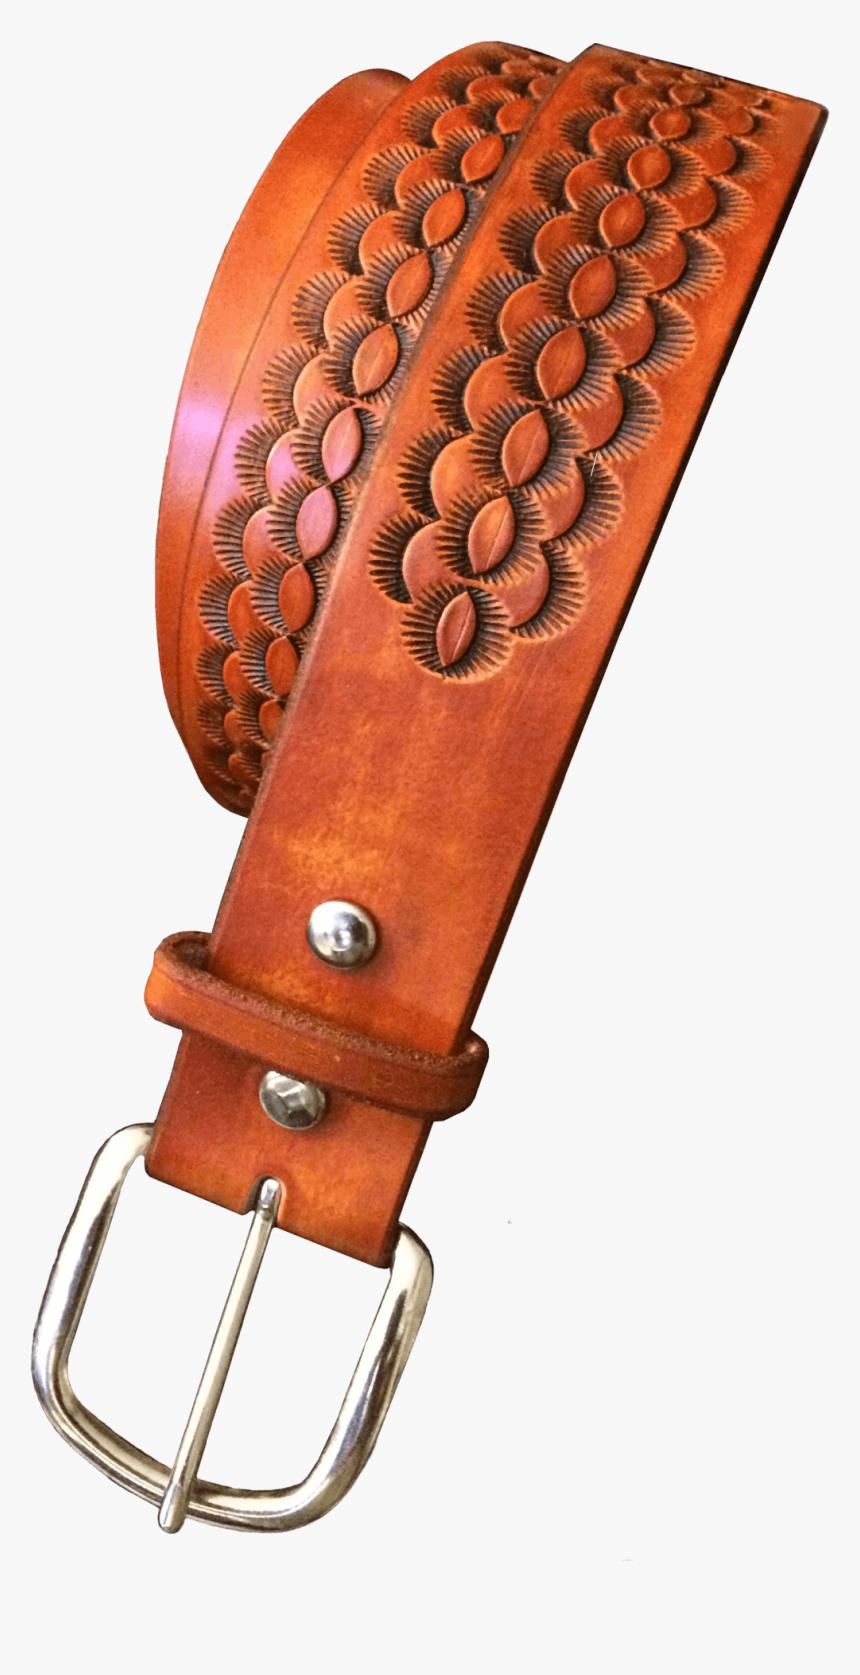 Arizona Hand Tooled Belt - Belt, HD Png Download, Free Download